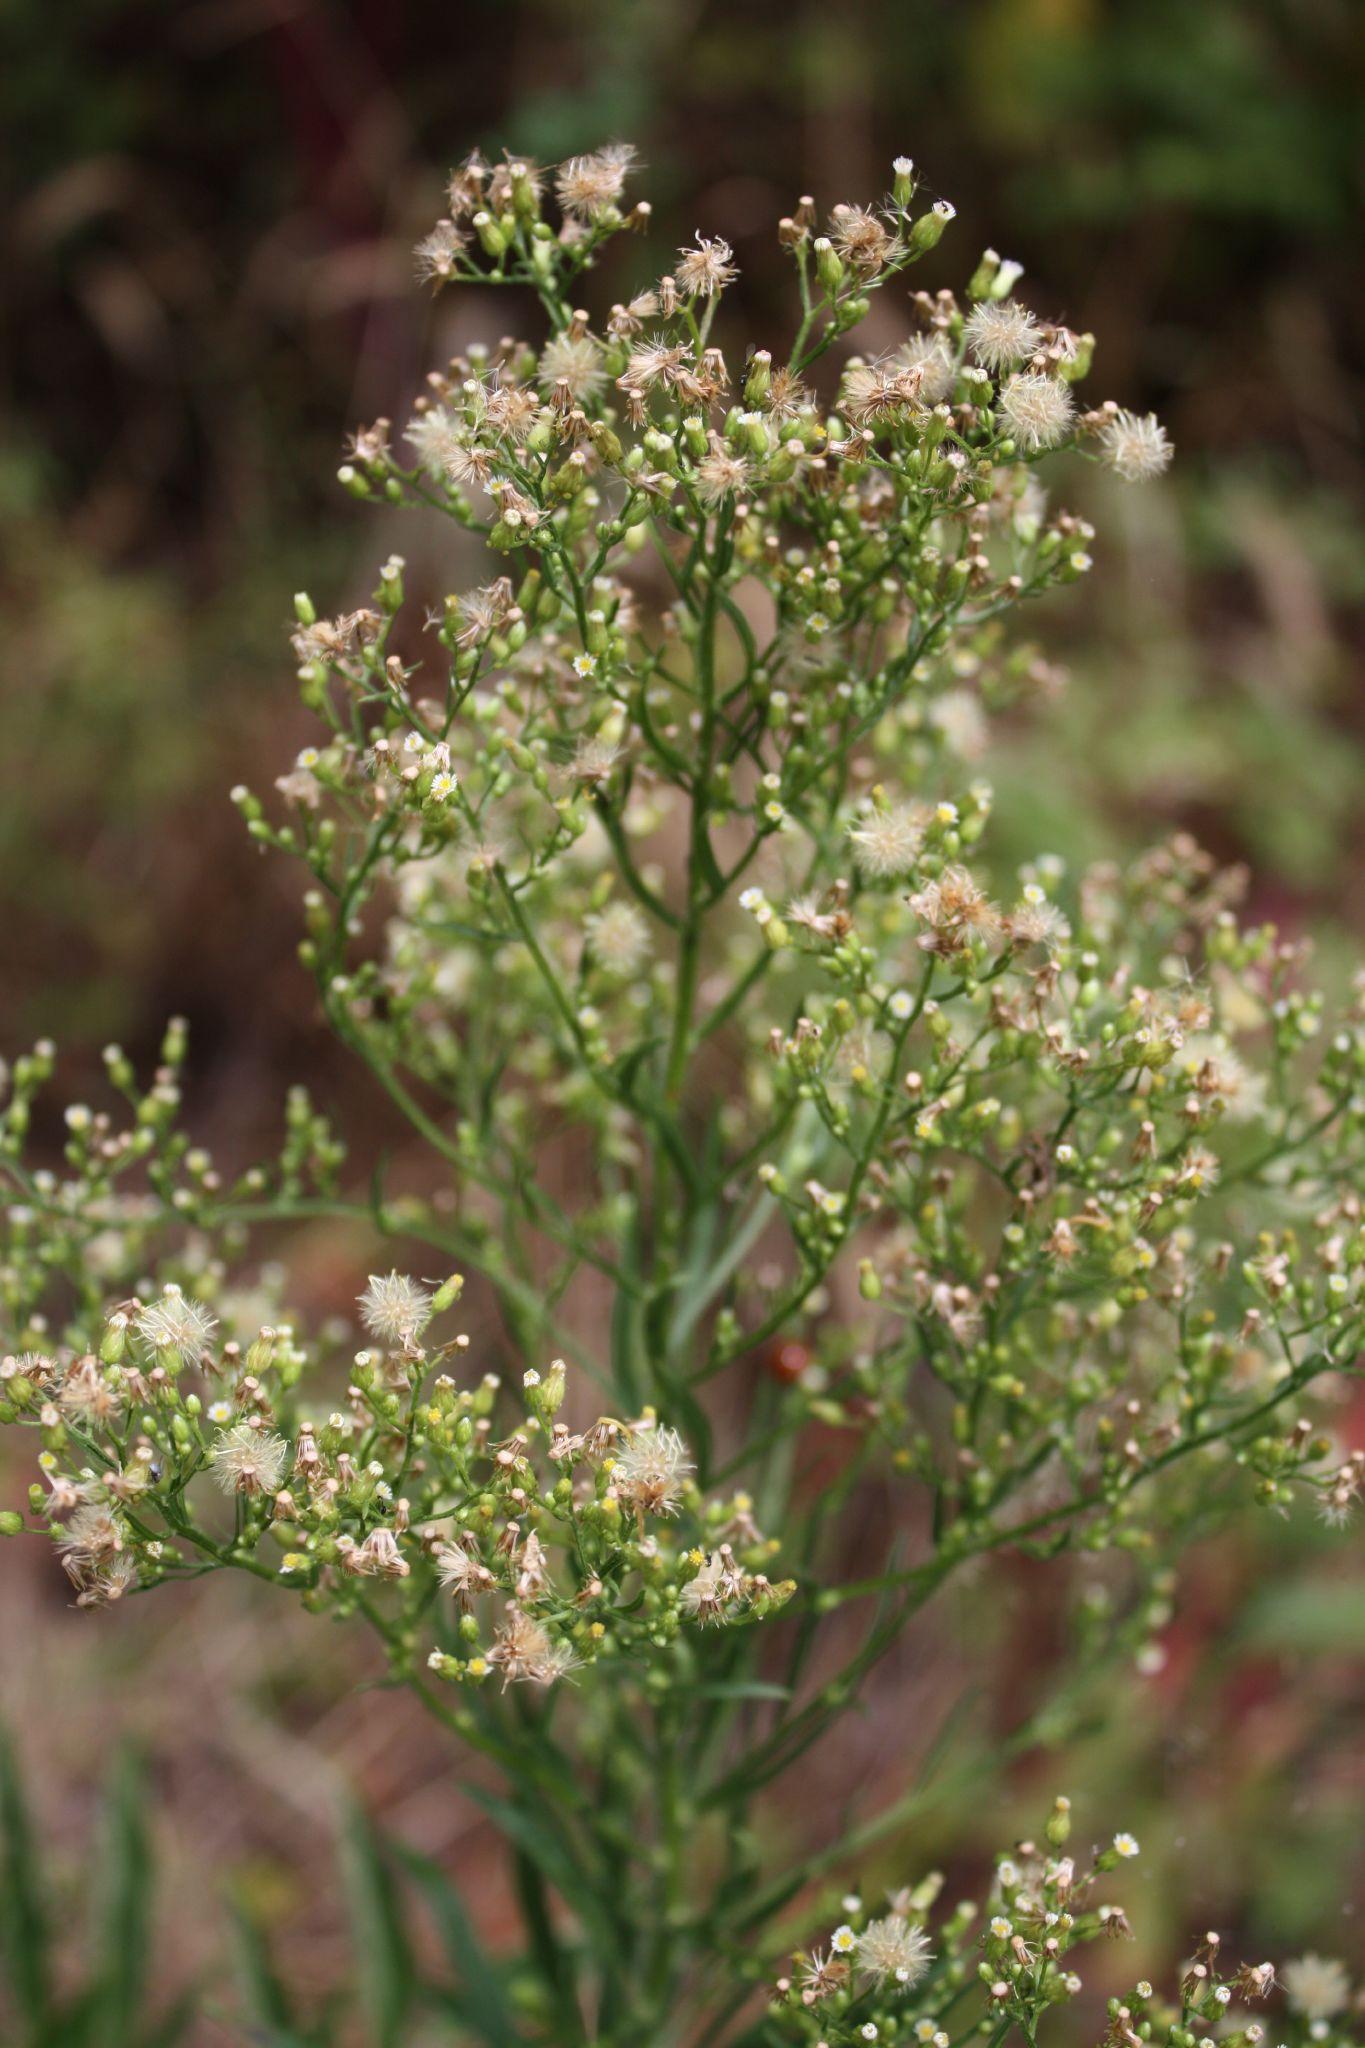 Horseweed, (Conyza canadensis). Photo credit: Phillip Merritt